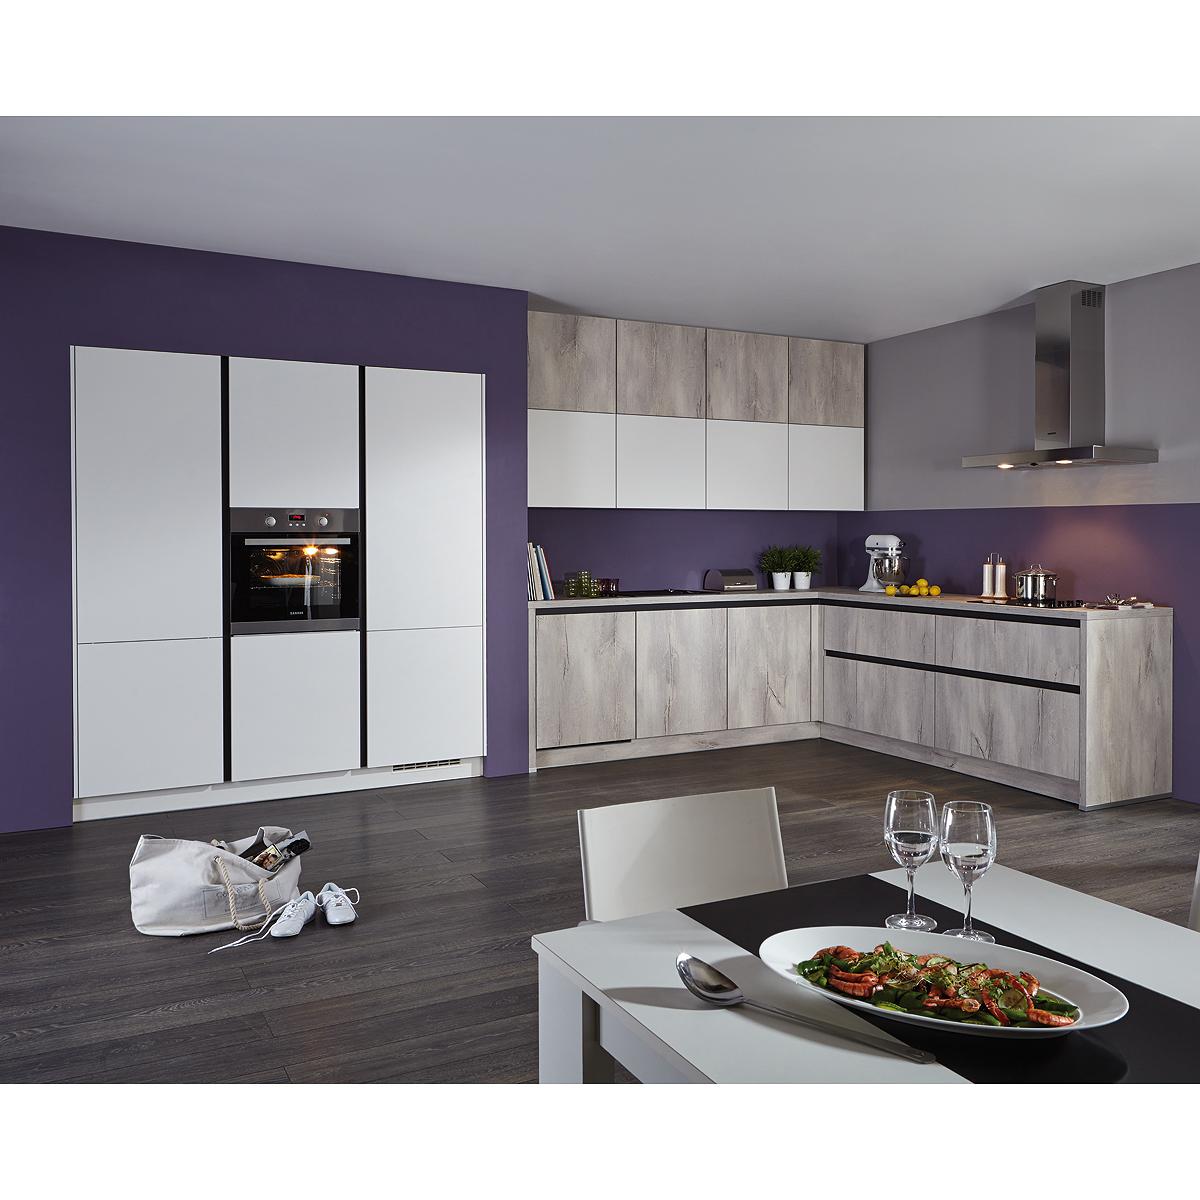 brigitte k che einbauk che l k che inklusive e ger te mit vielen farben 1503 ebay. Black Bedroom Furniture Sets. Home Design Ideas